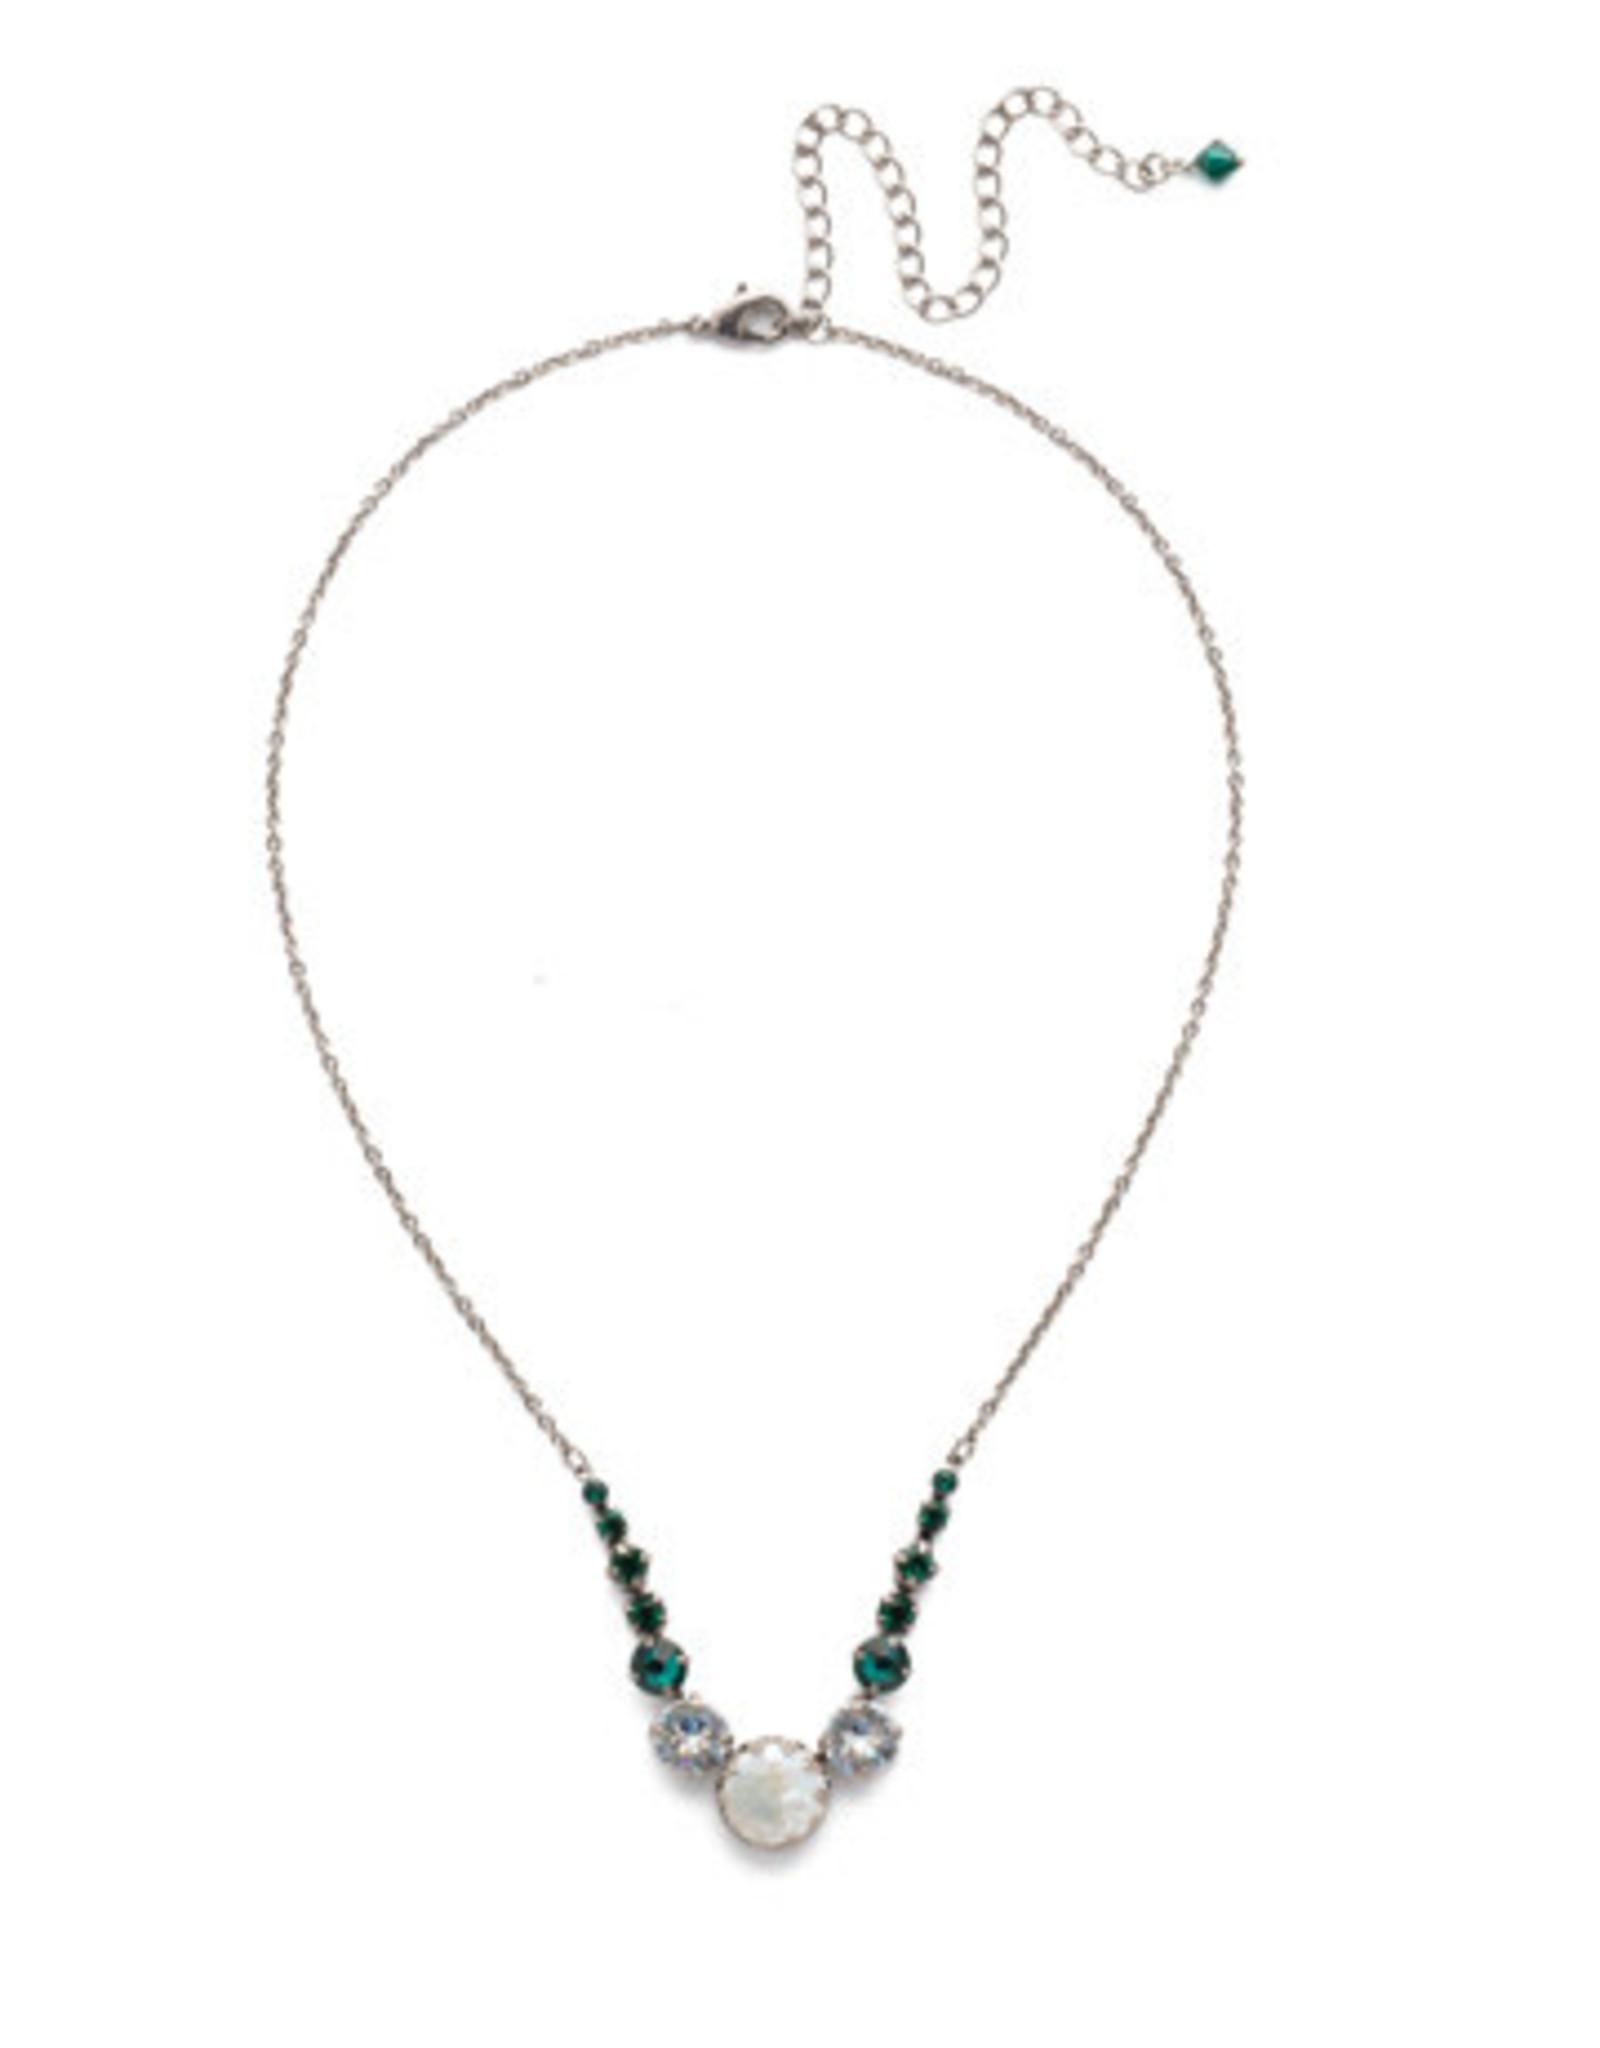 Sorrelli NEF43ASSNM - Snowy Moss Meera Classic Necklace